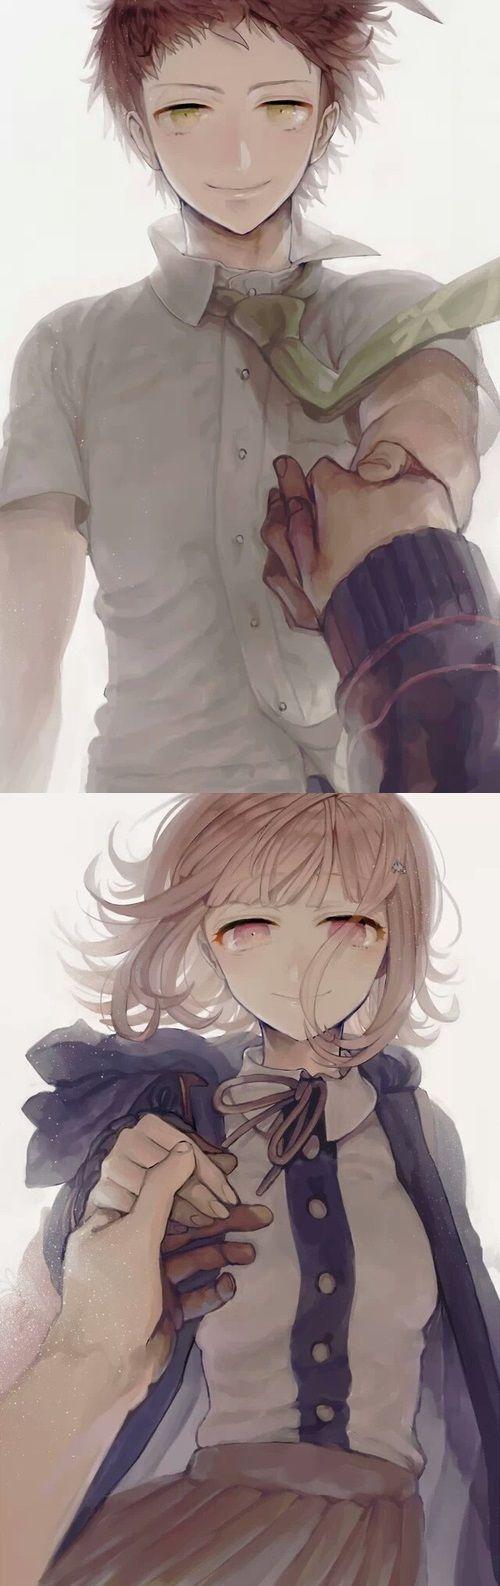 Nanami Chiaki ♥ Hajime Hinata